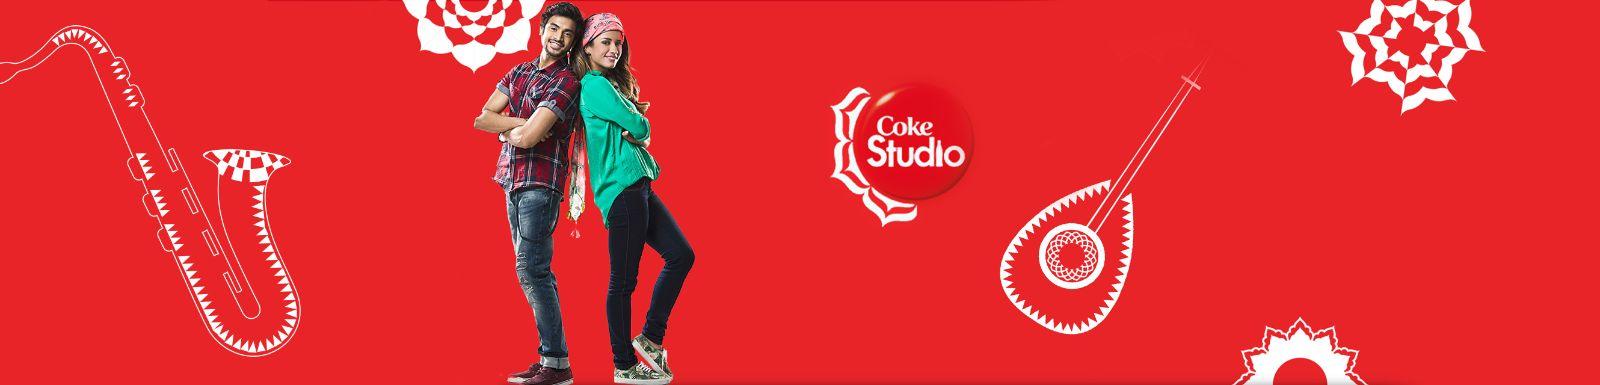 ������ ������ ������ Coke Studio ������ ������ ������ 6 ������� ����� 2014